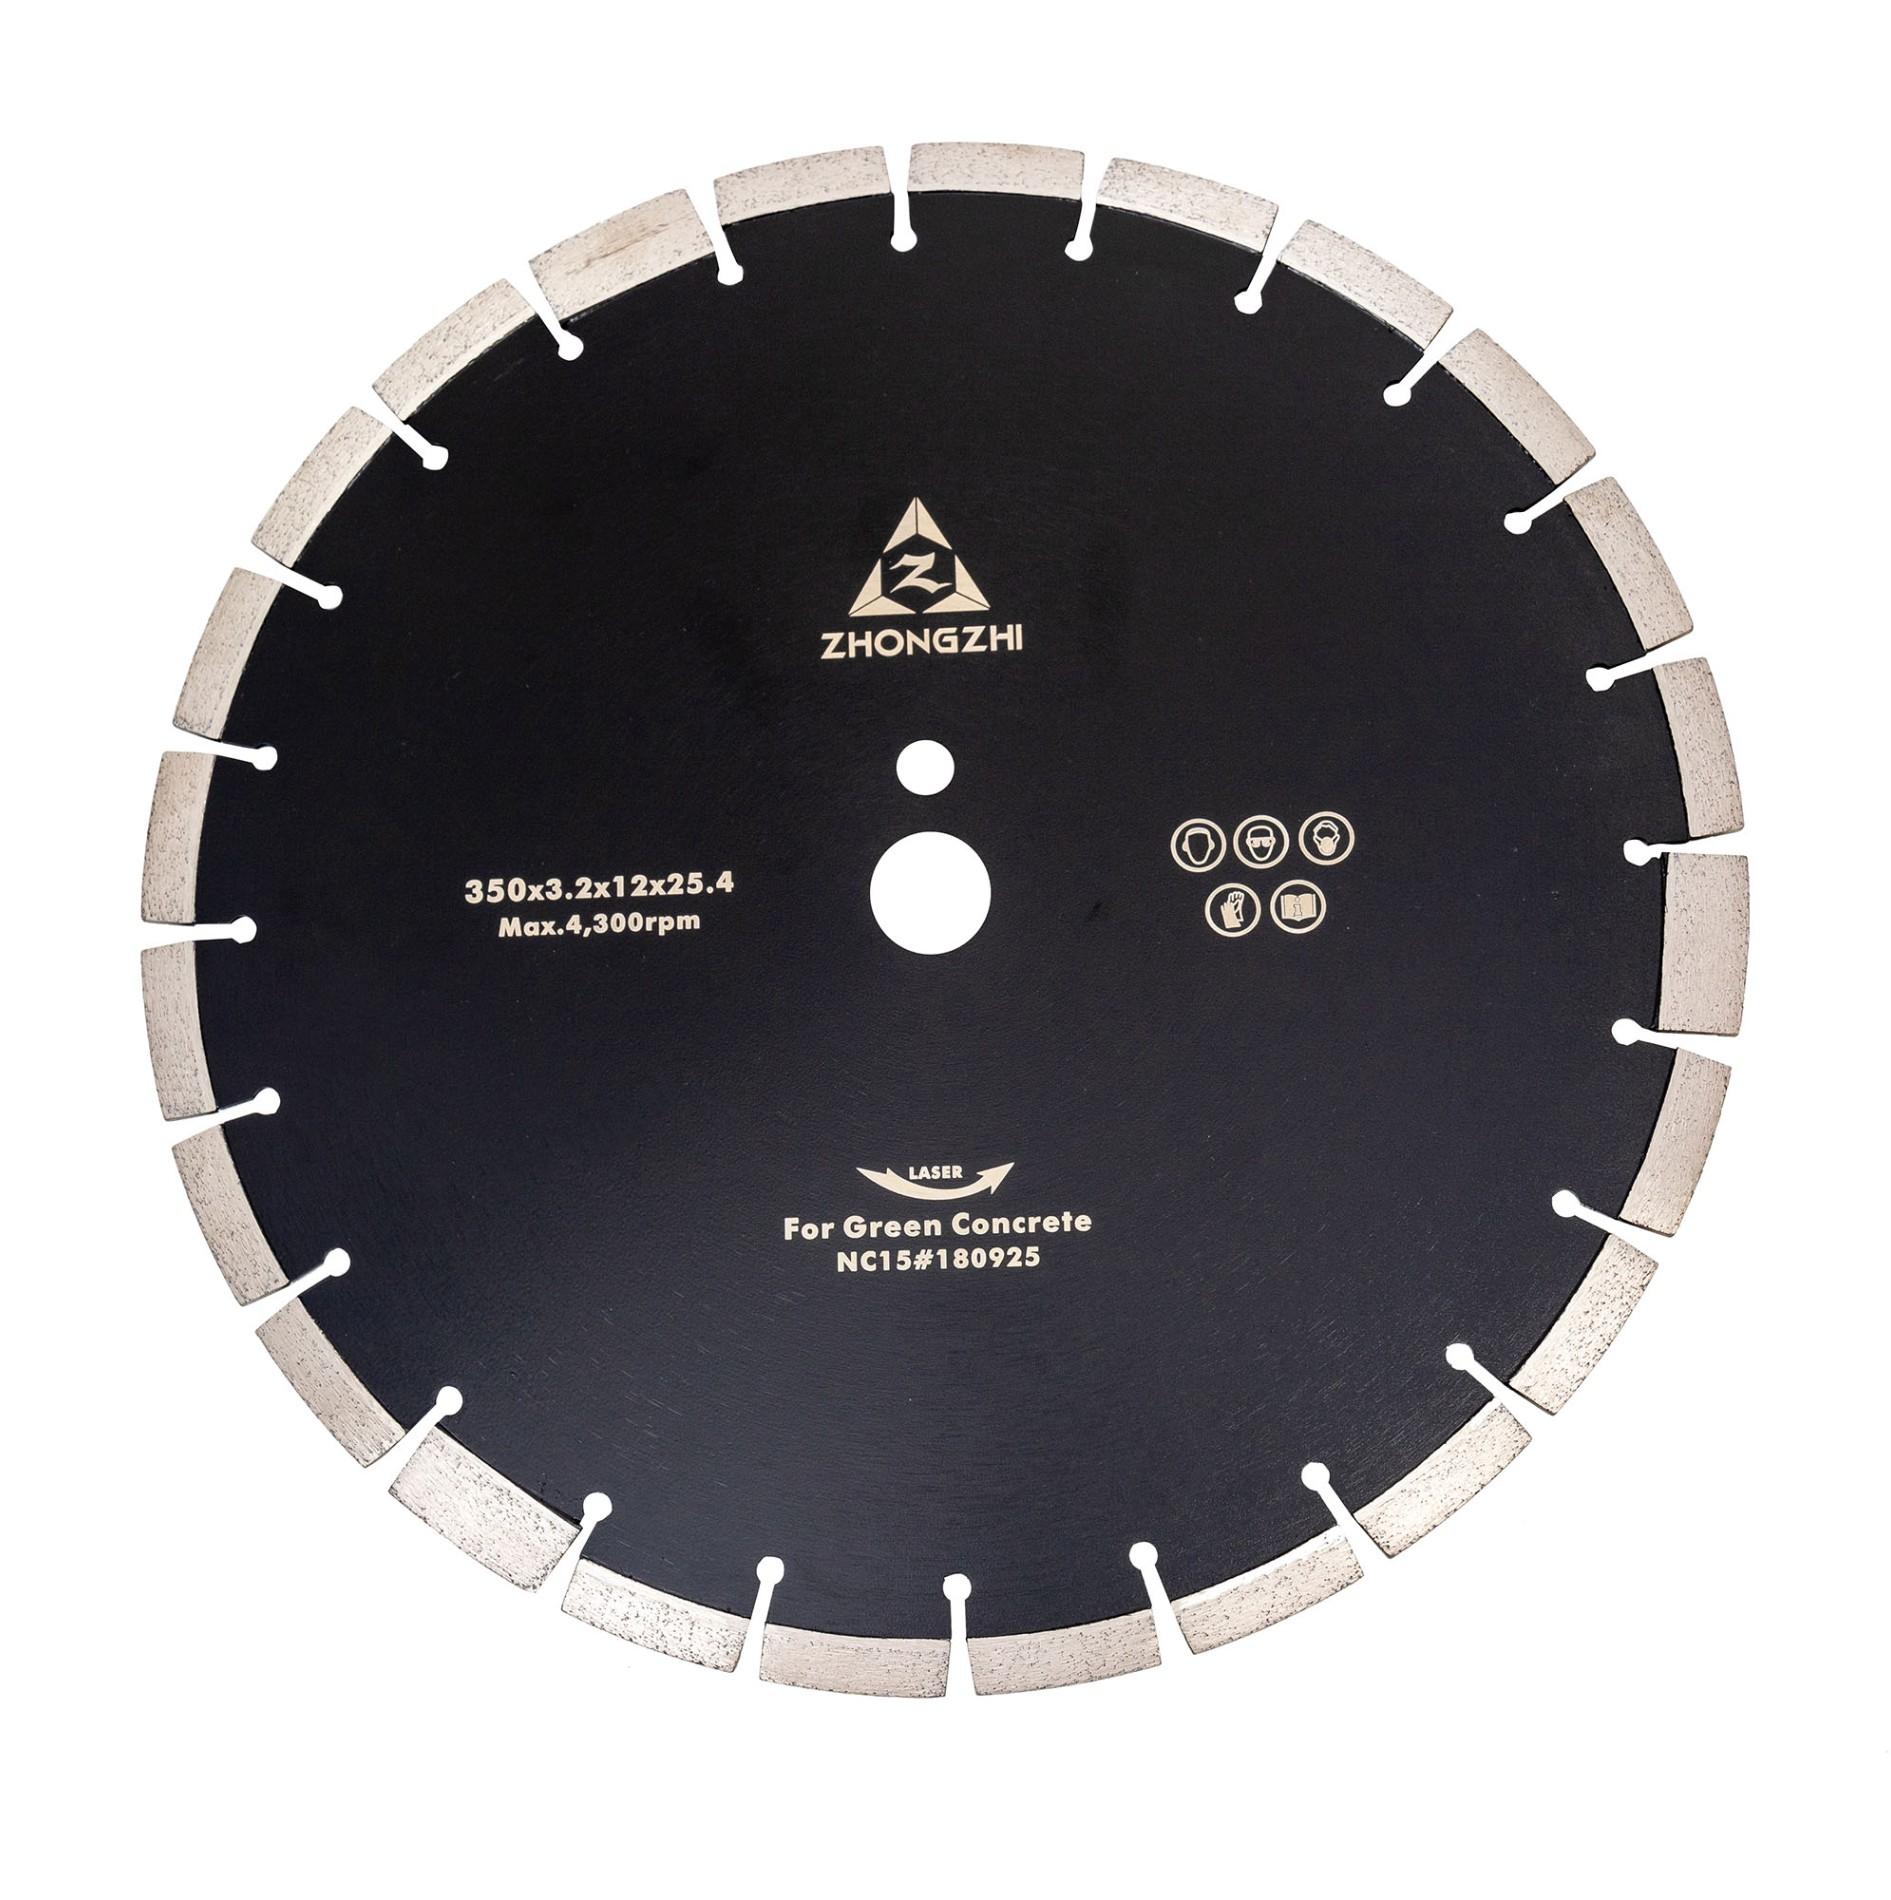 Laser Diamond GreenConcrete Blade for Construction